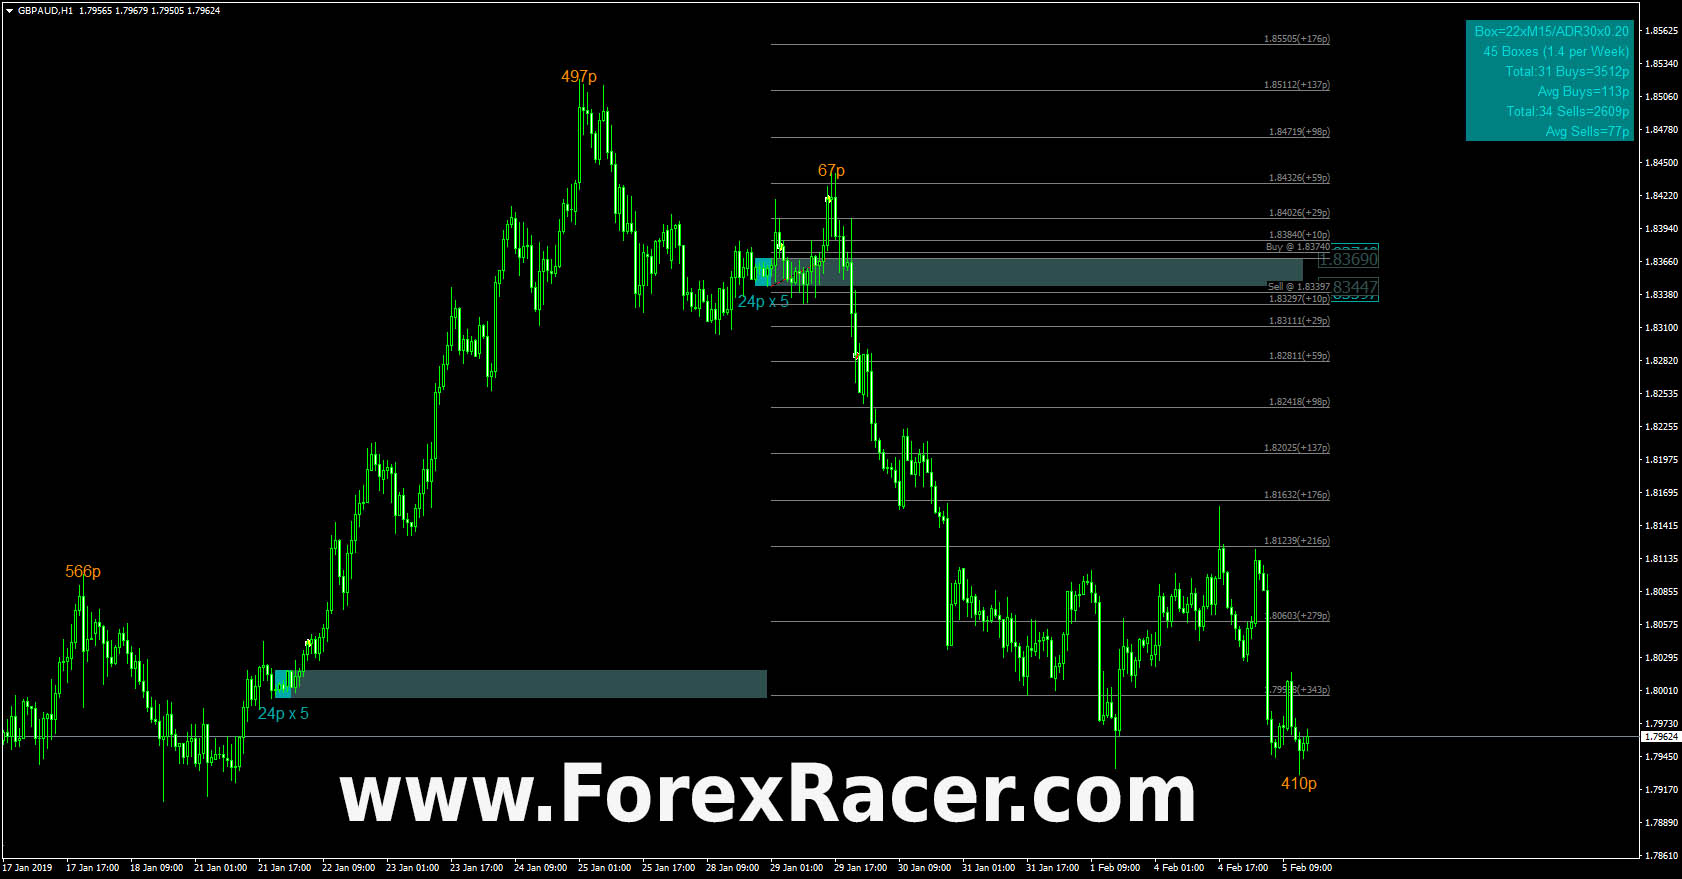 SQ Dynamic Breakout Box - Free Download - MT4 & MT5 - Forex Racer